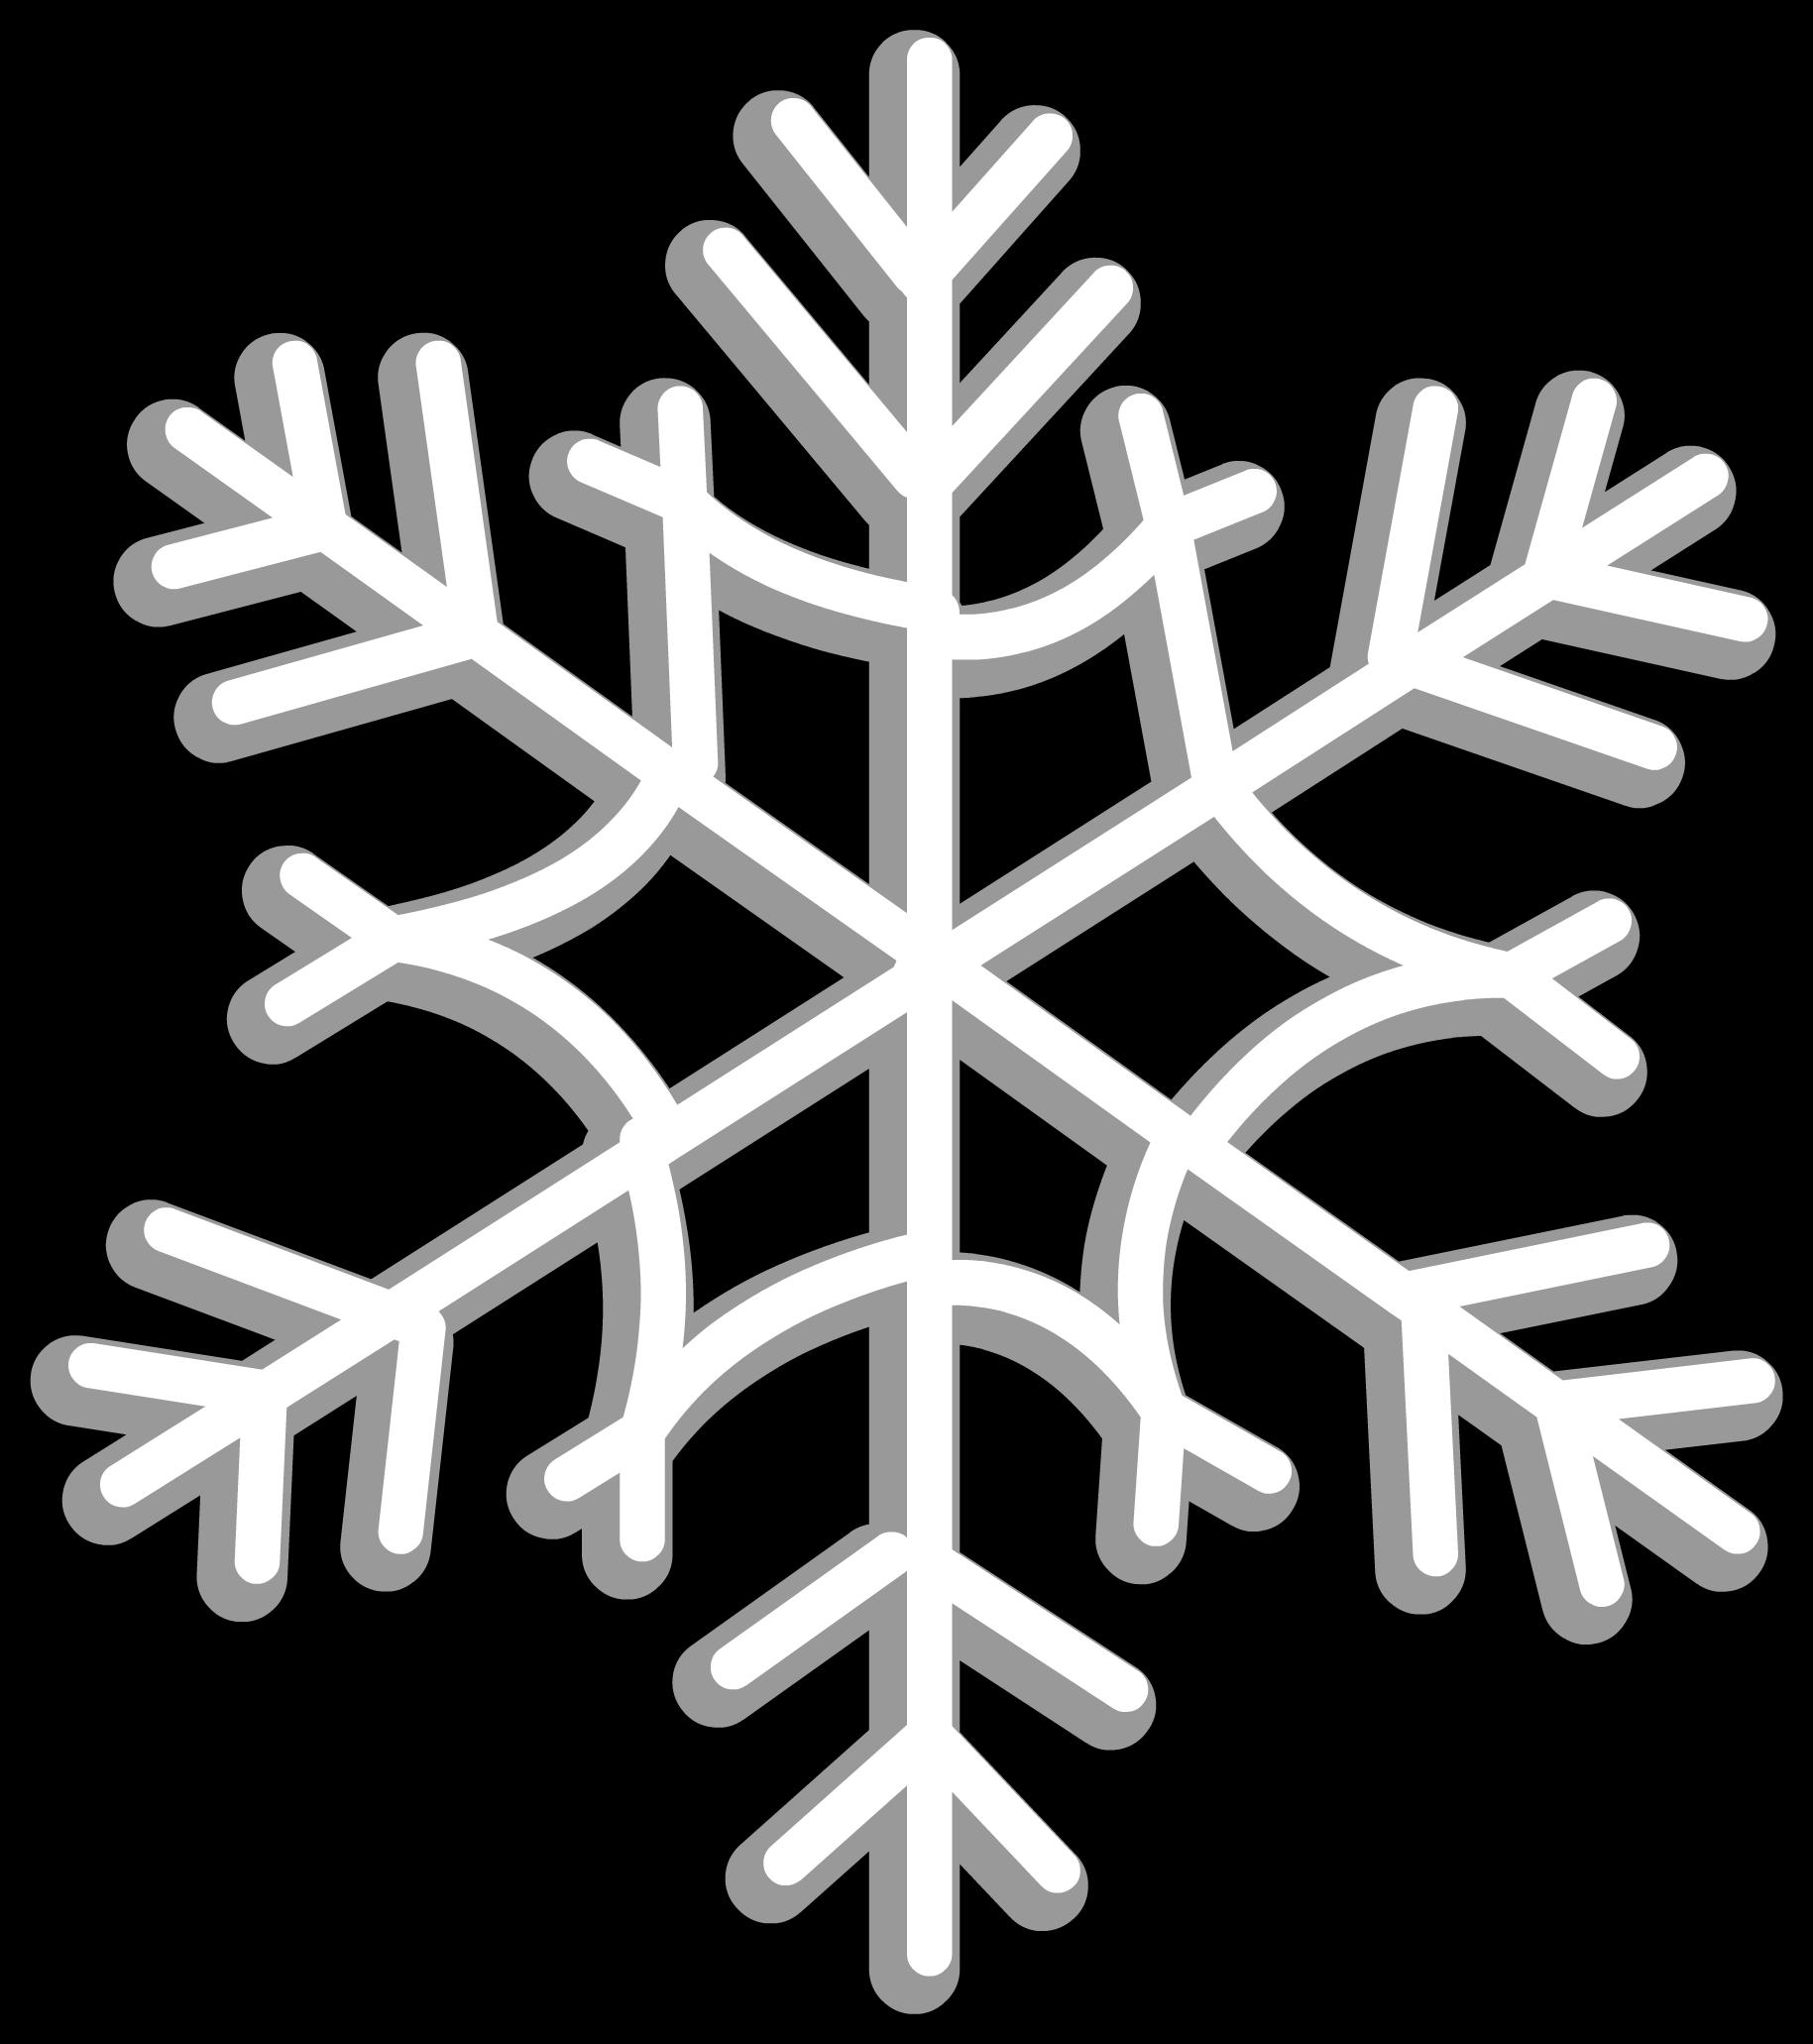 Download Snowflake Furniture Floco De Neve Frozen Desenho Png